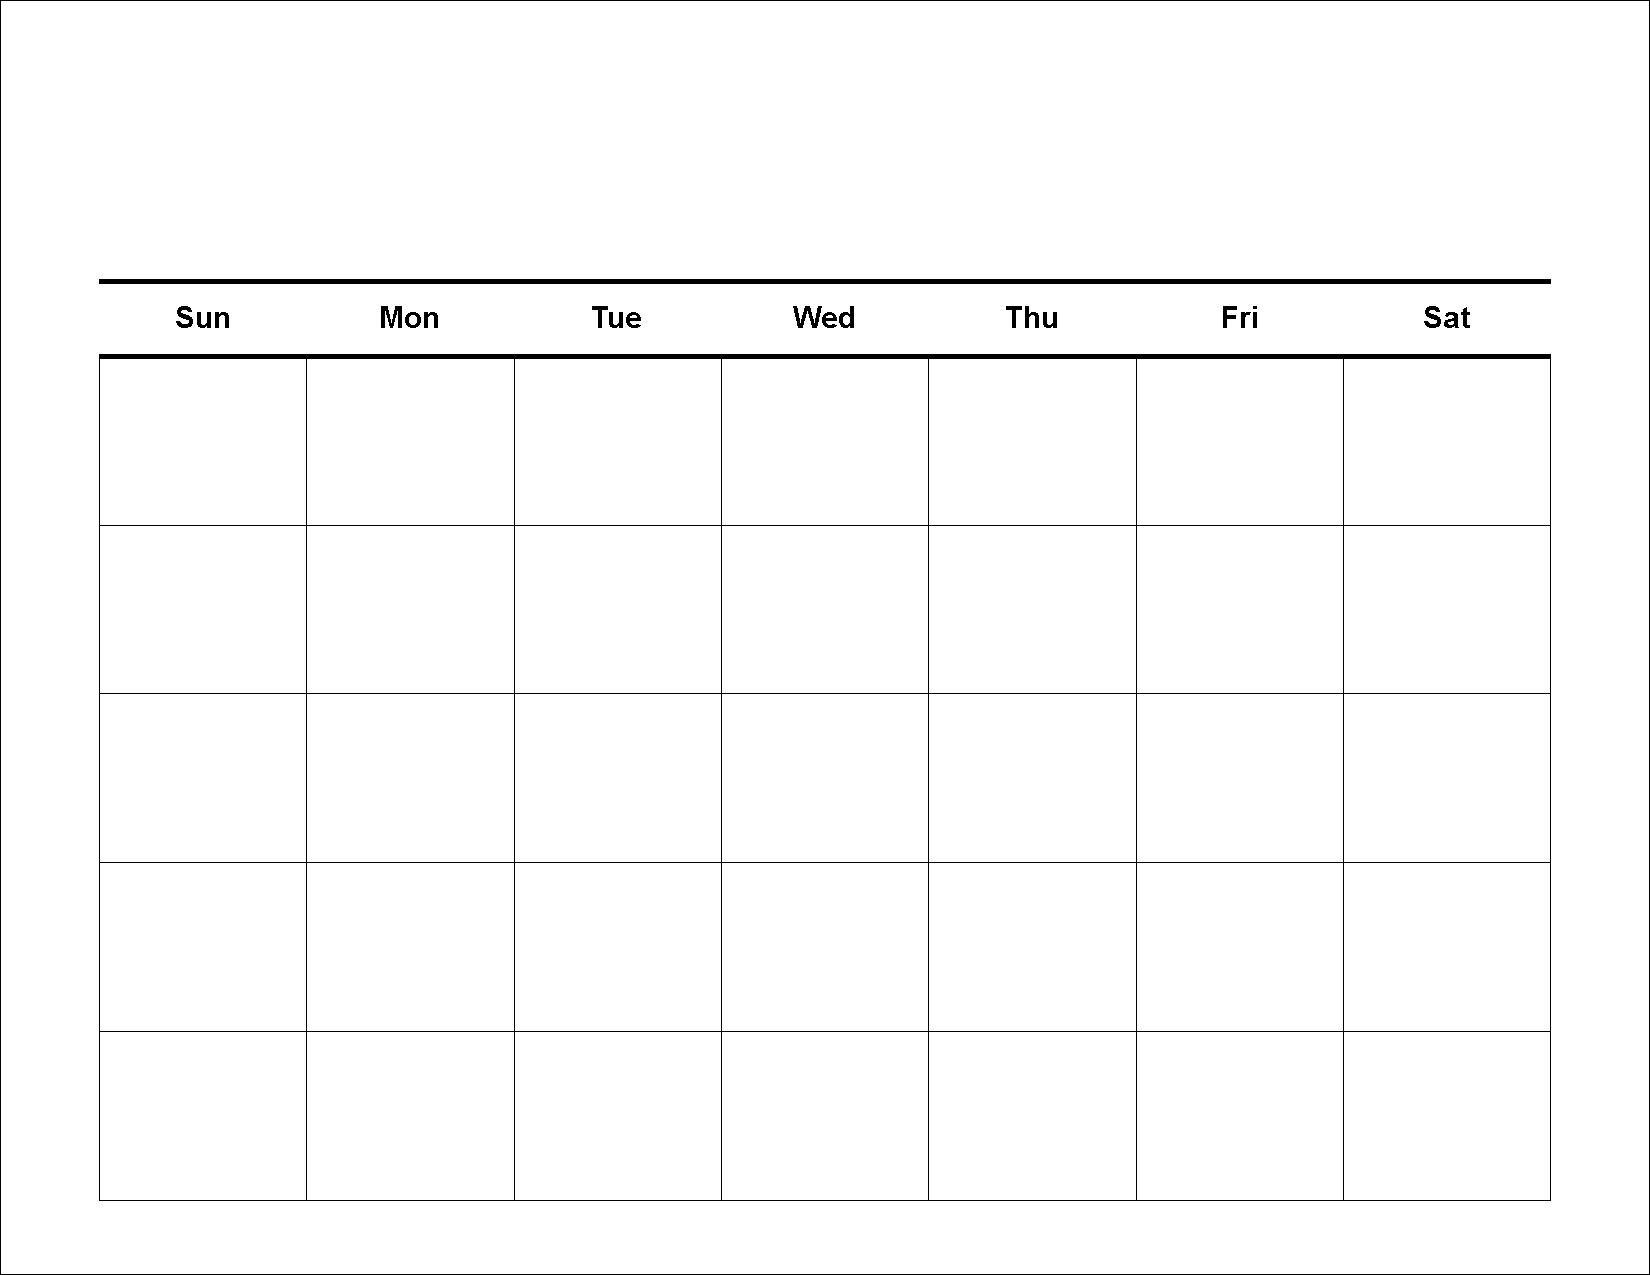 Blank 5 Day Week Calendar | Template Calendar Printable pertaining to Blank Calendar 5 Day Week